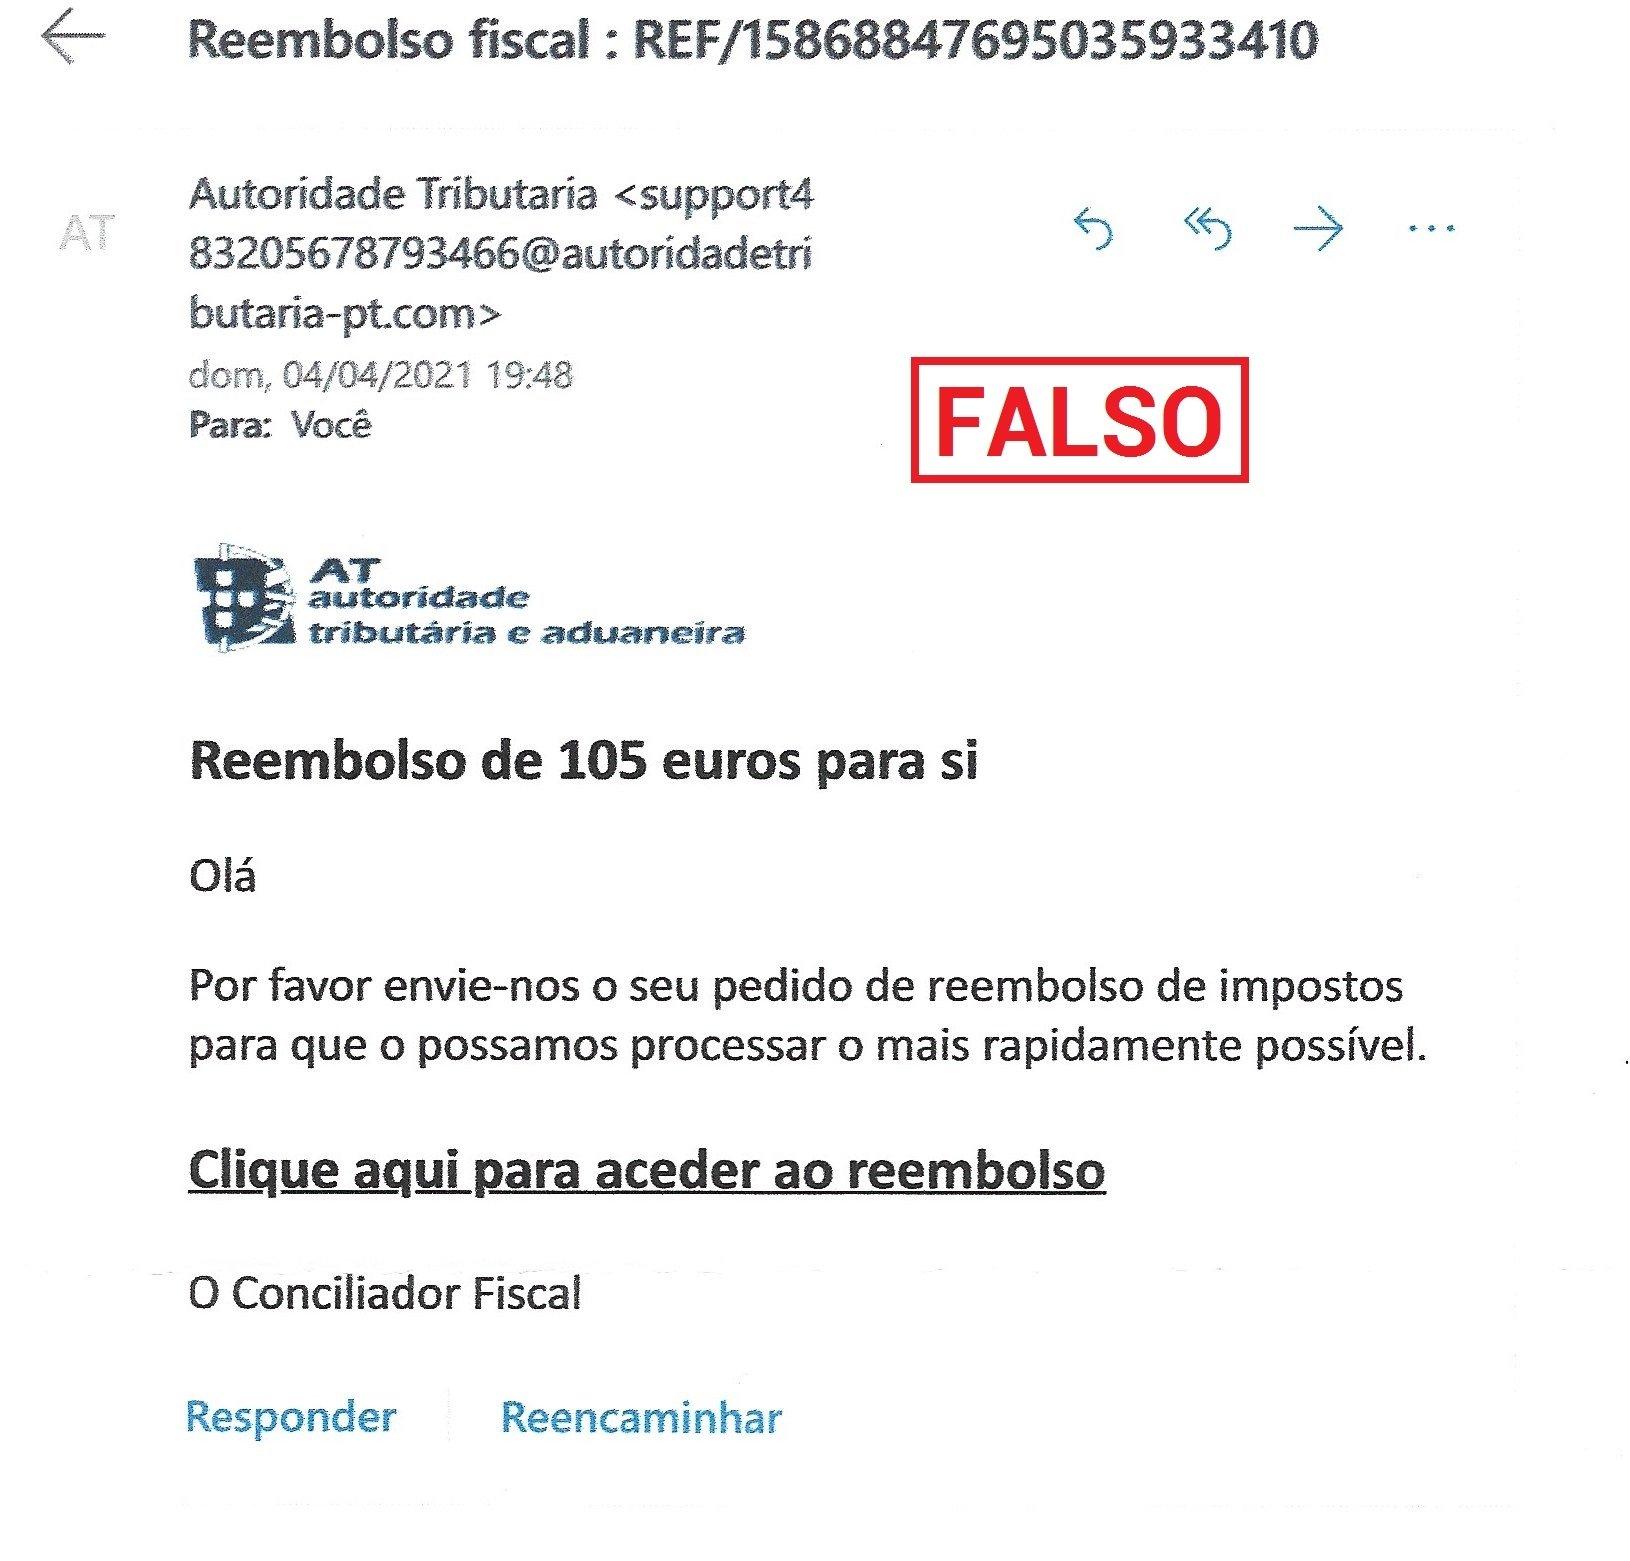 exemplo de email falso